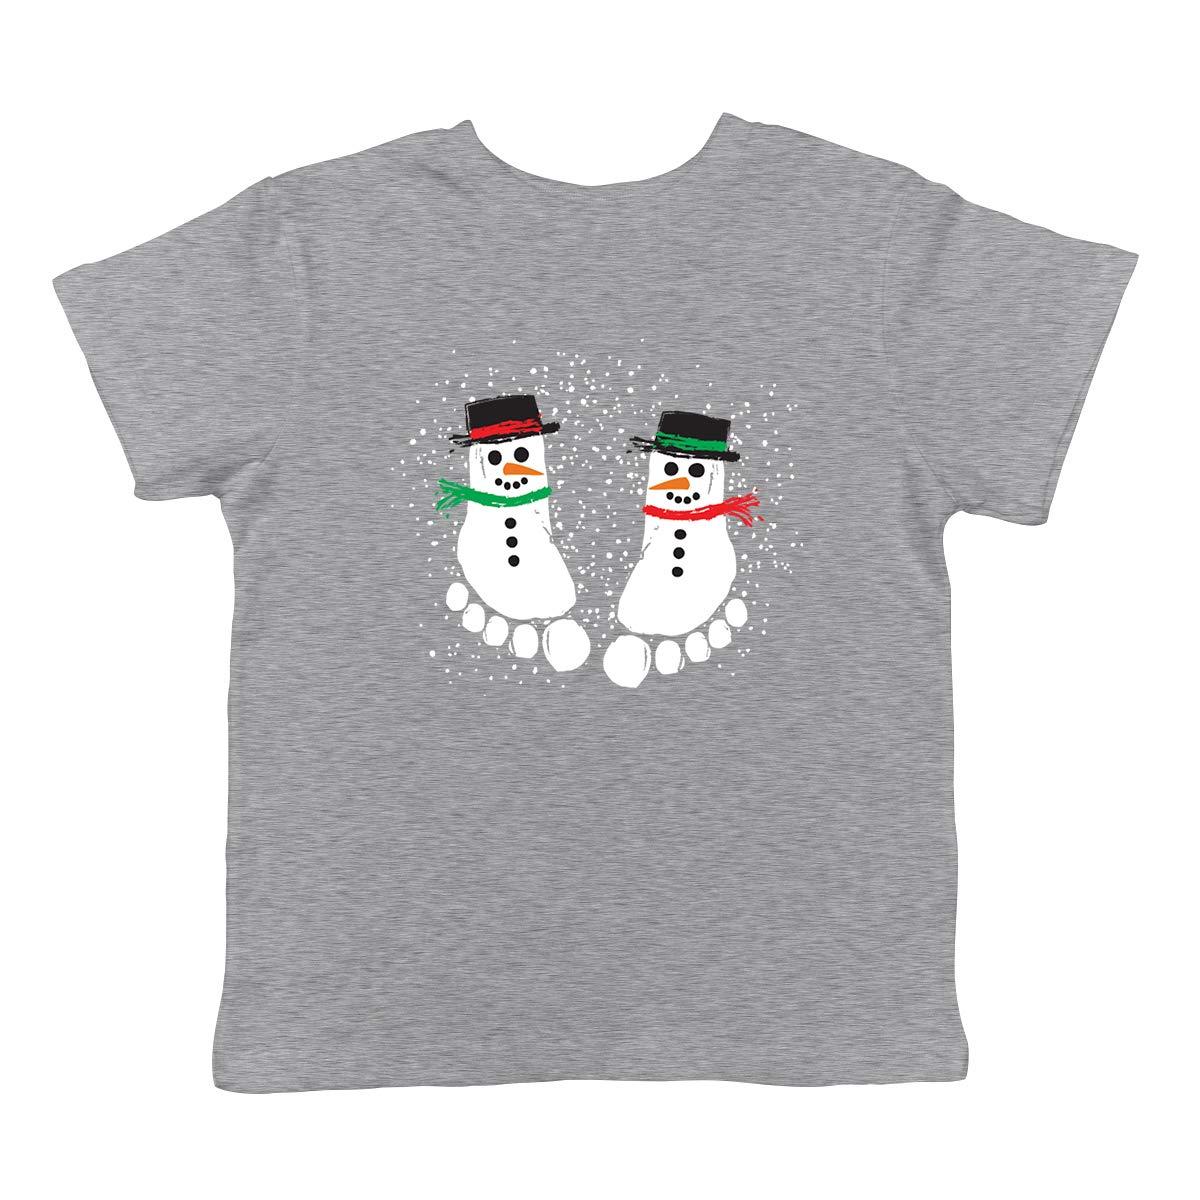 SpiritForged Apparel Snowman Footprint Painting Infant T-Shirt